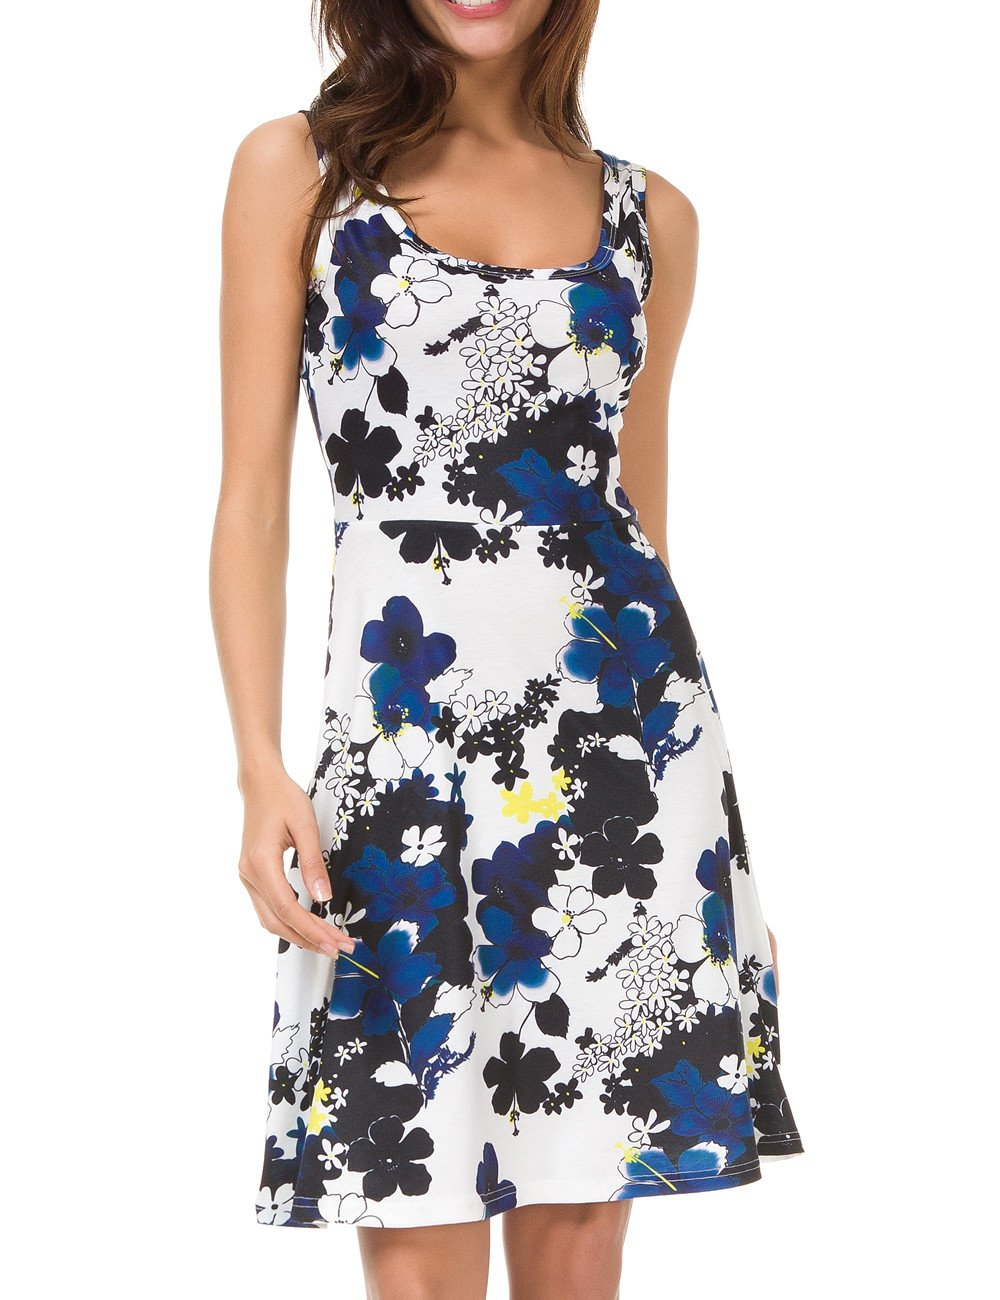 bb21691b9b0c Galleon - Herou Women Sleeveless Beach Casual Flared Floral Tank Dress  (Flower-31-1, Small)